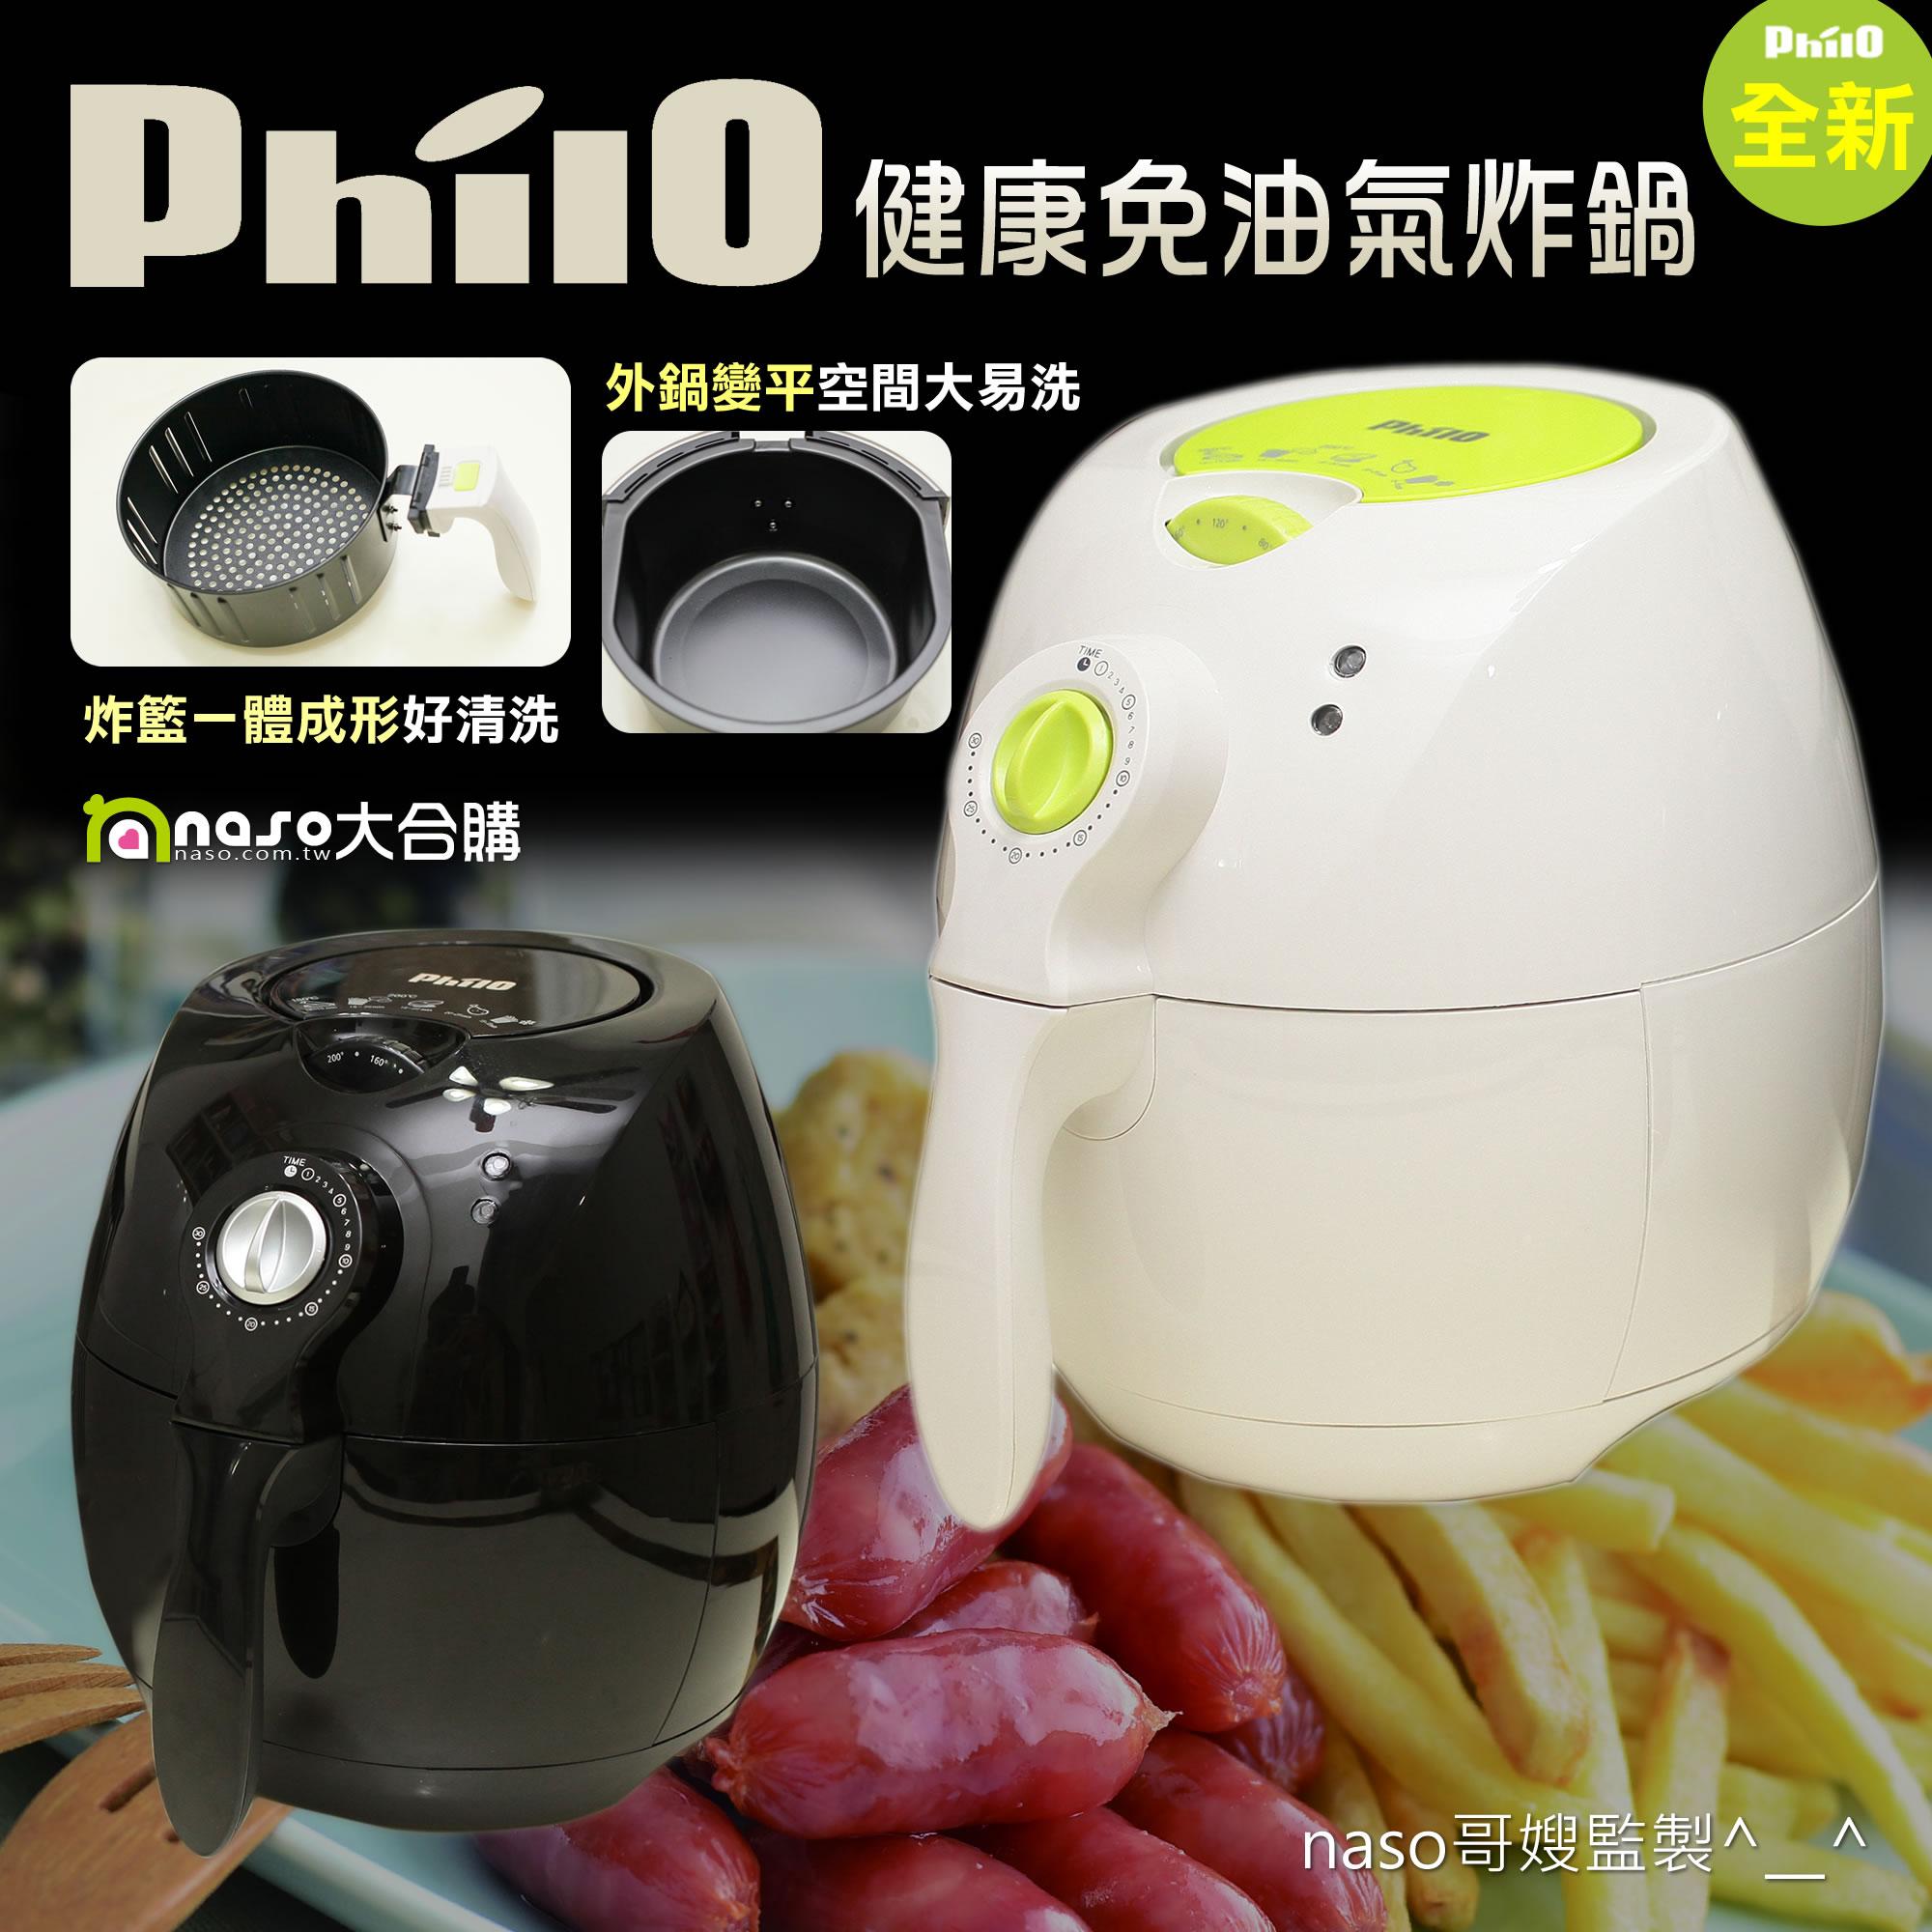 naso監製 全新第三代Philo健康免油氣炸鍋(獨家三年收送保固) 好評第21團